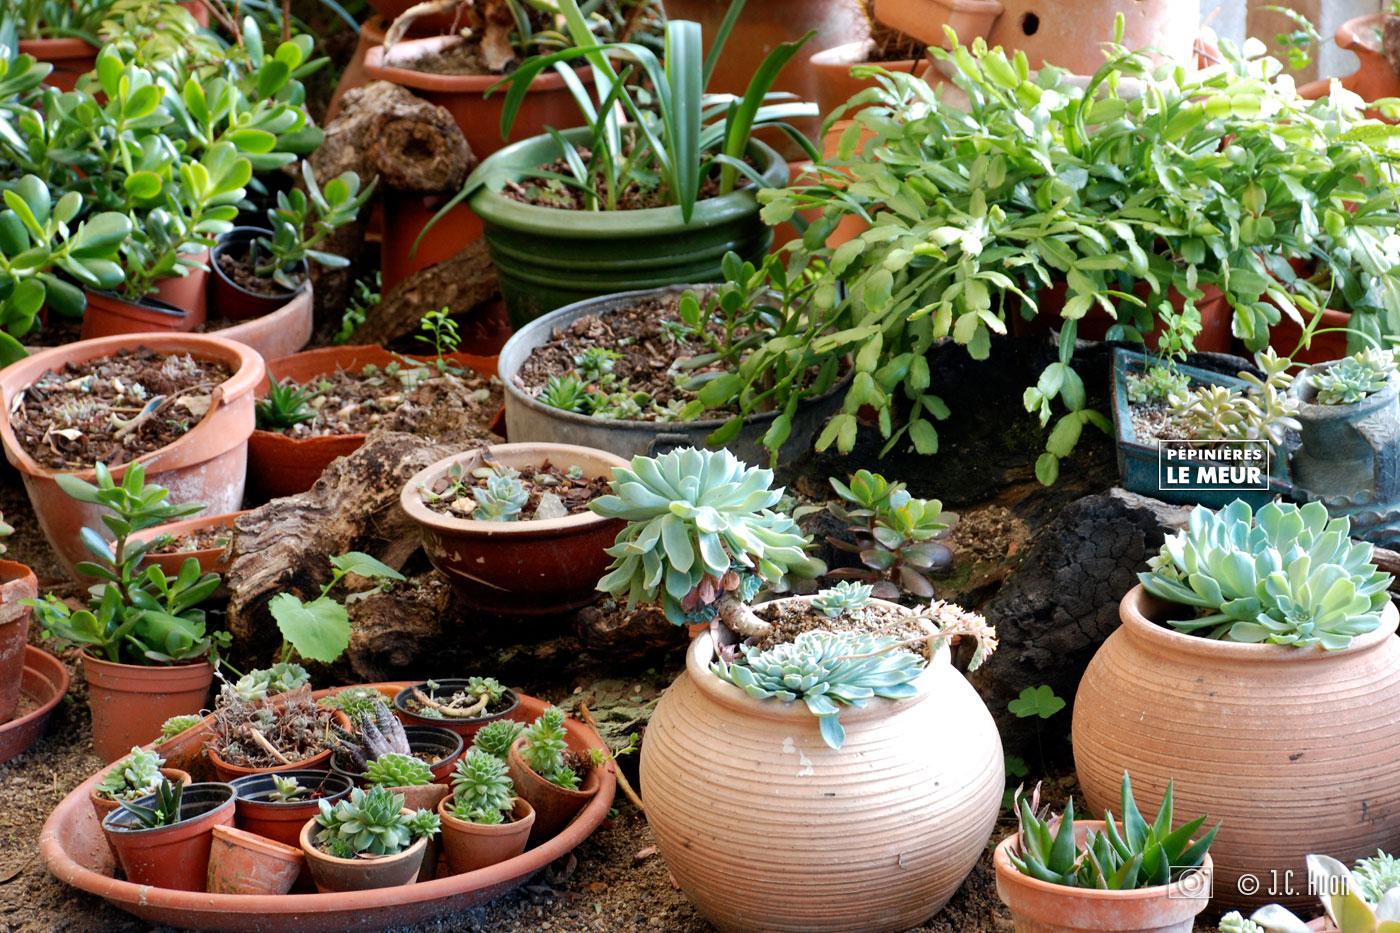 plantes-succulentes_huon01